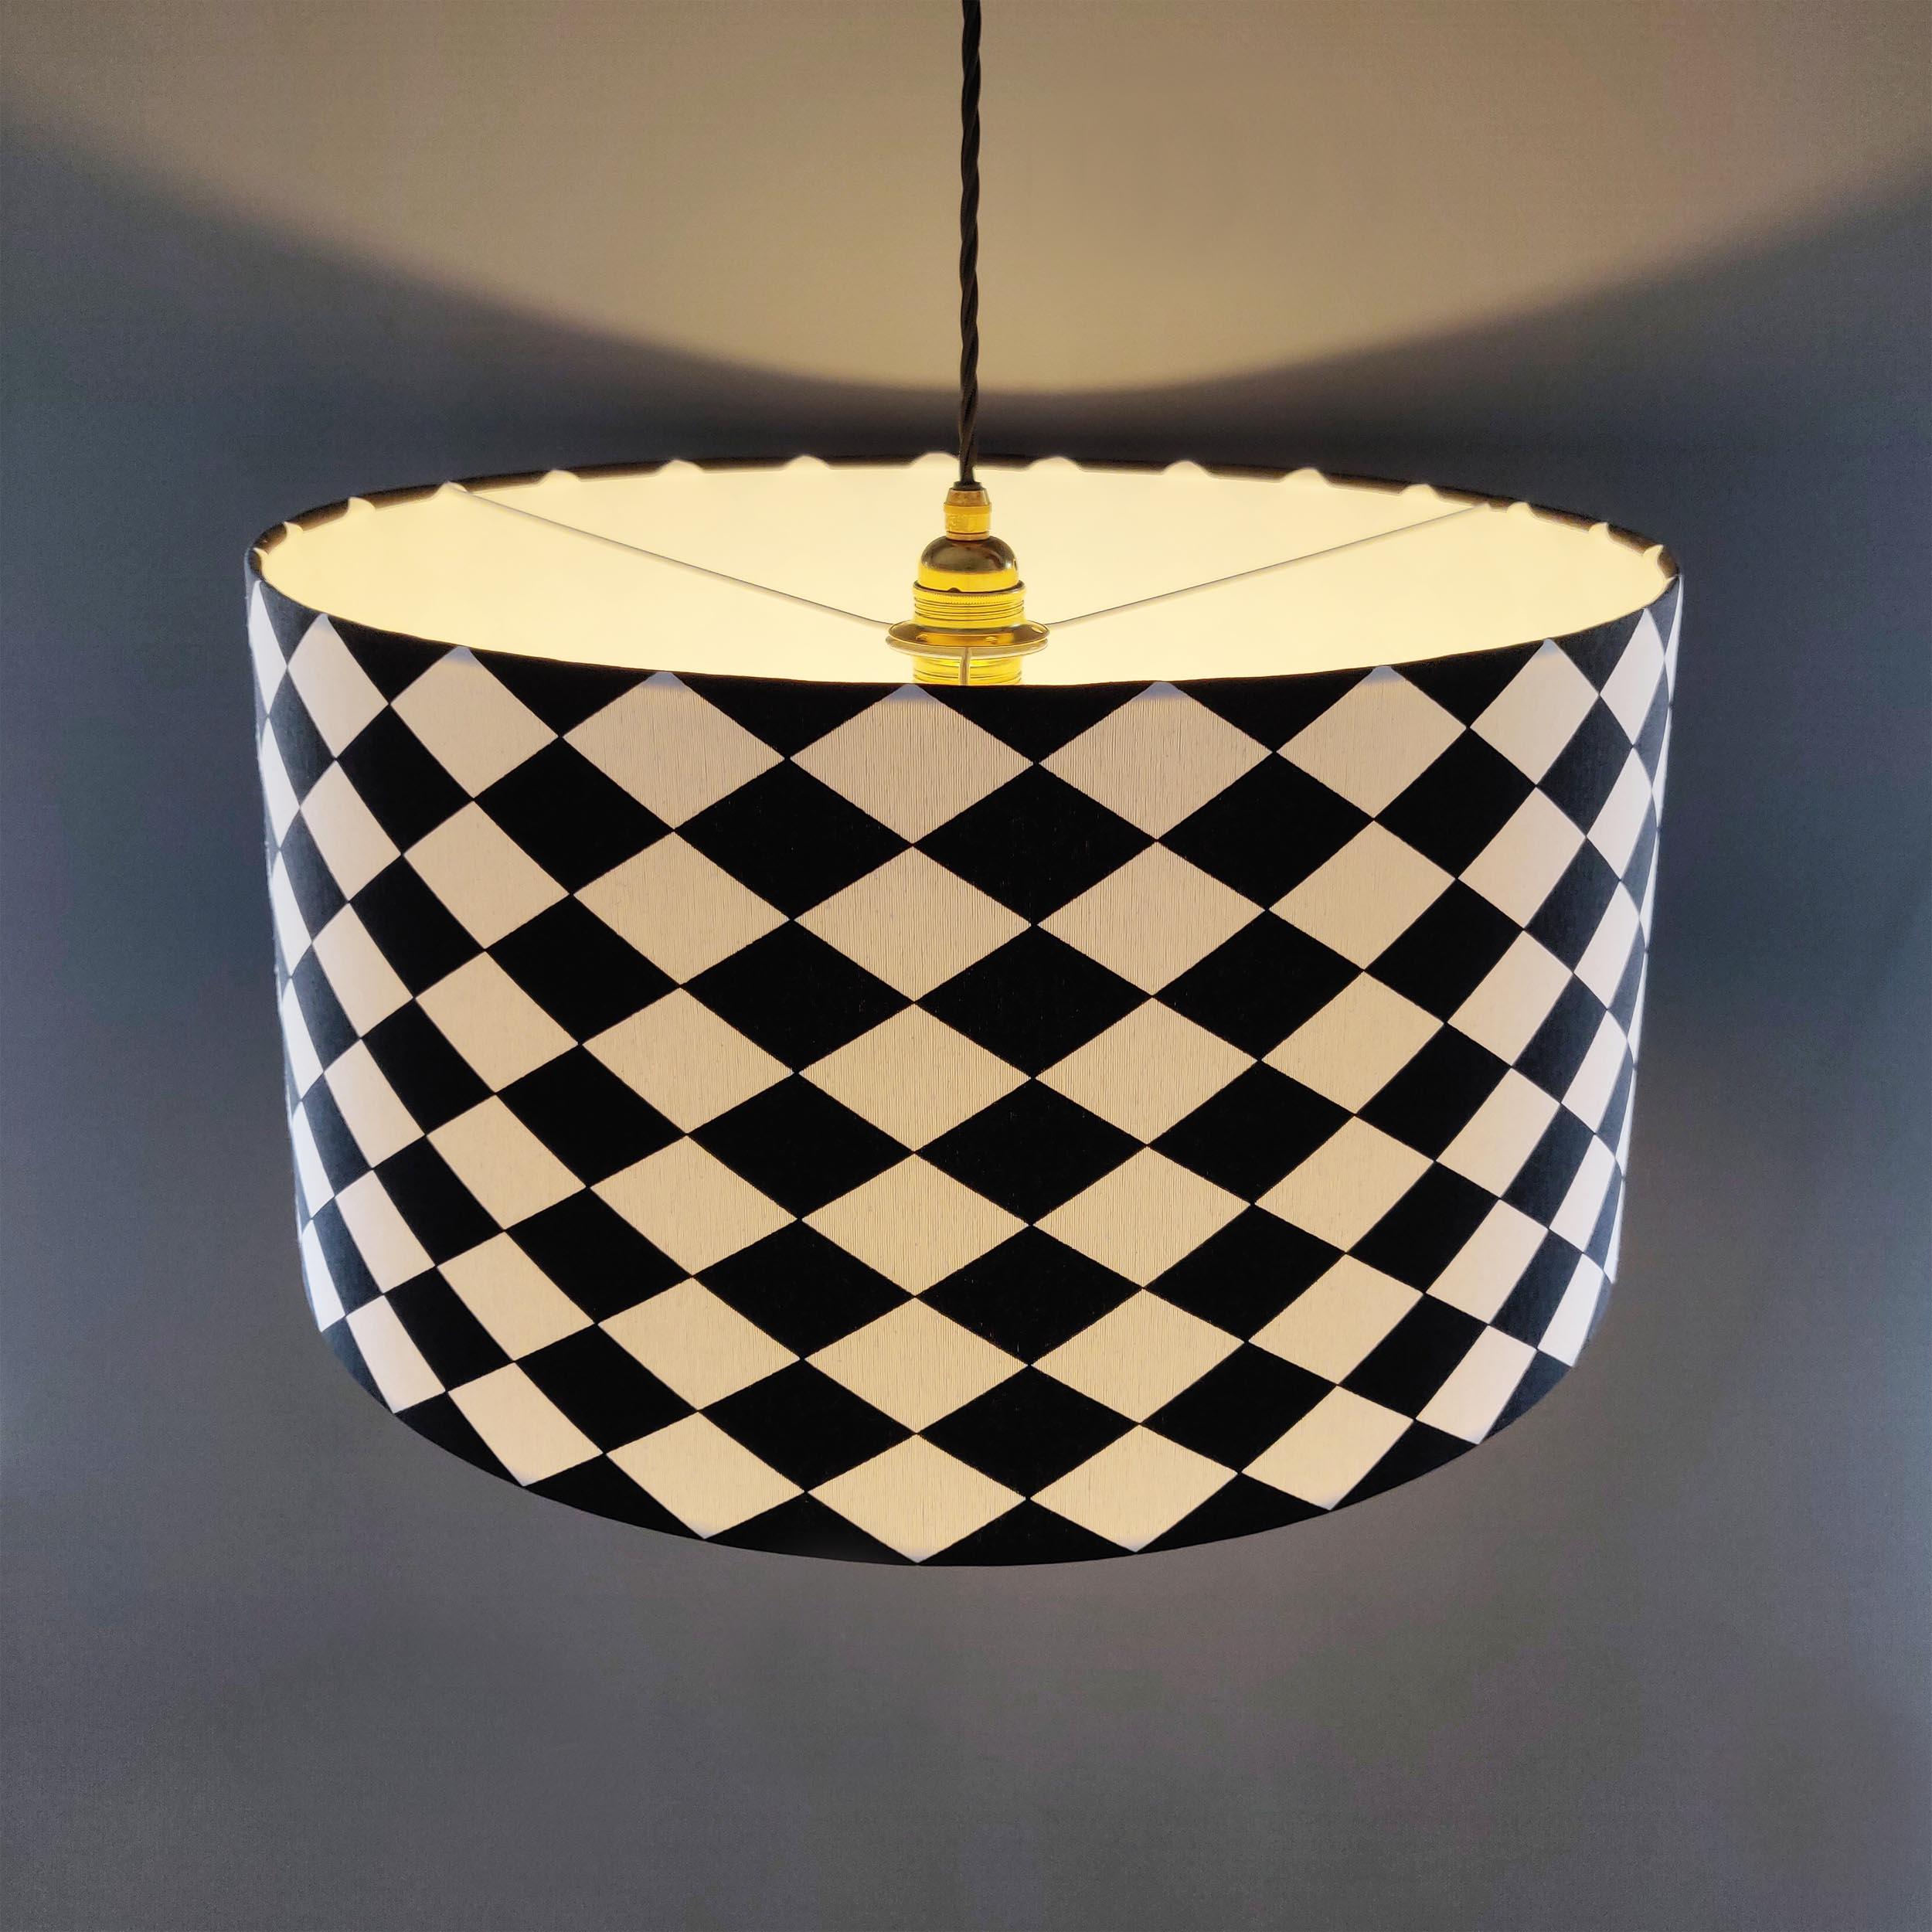 Black and White Monochrome Lampshade